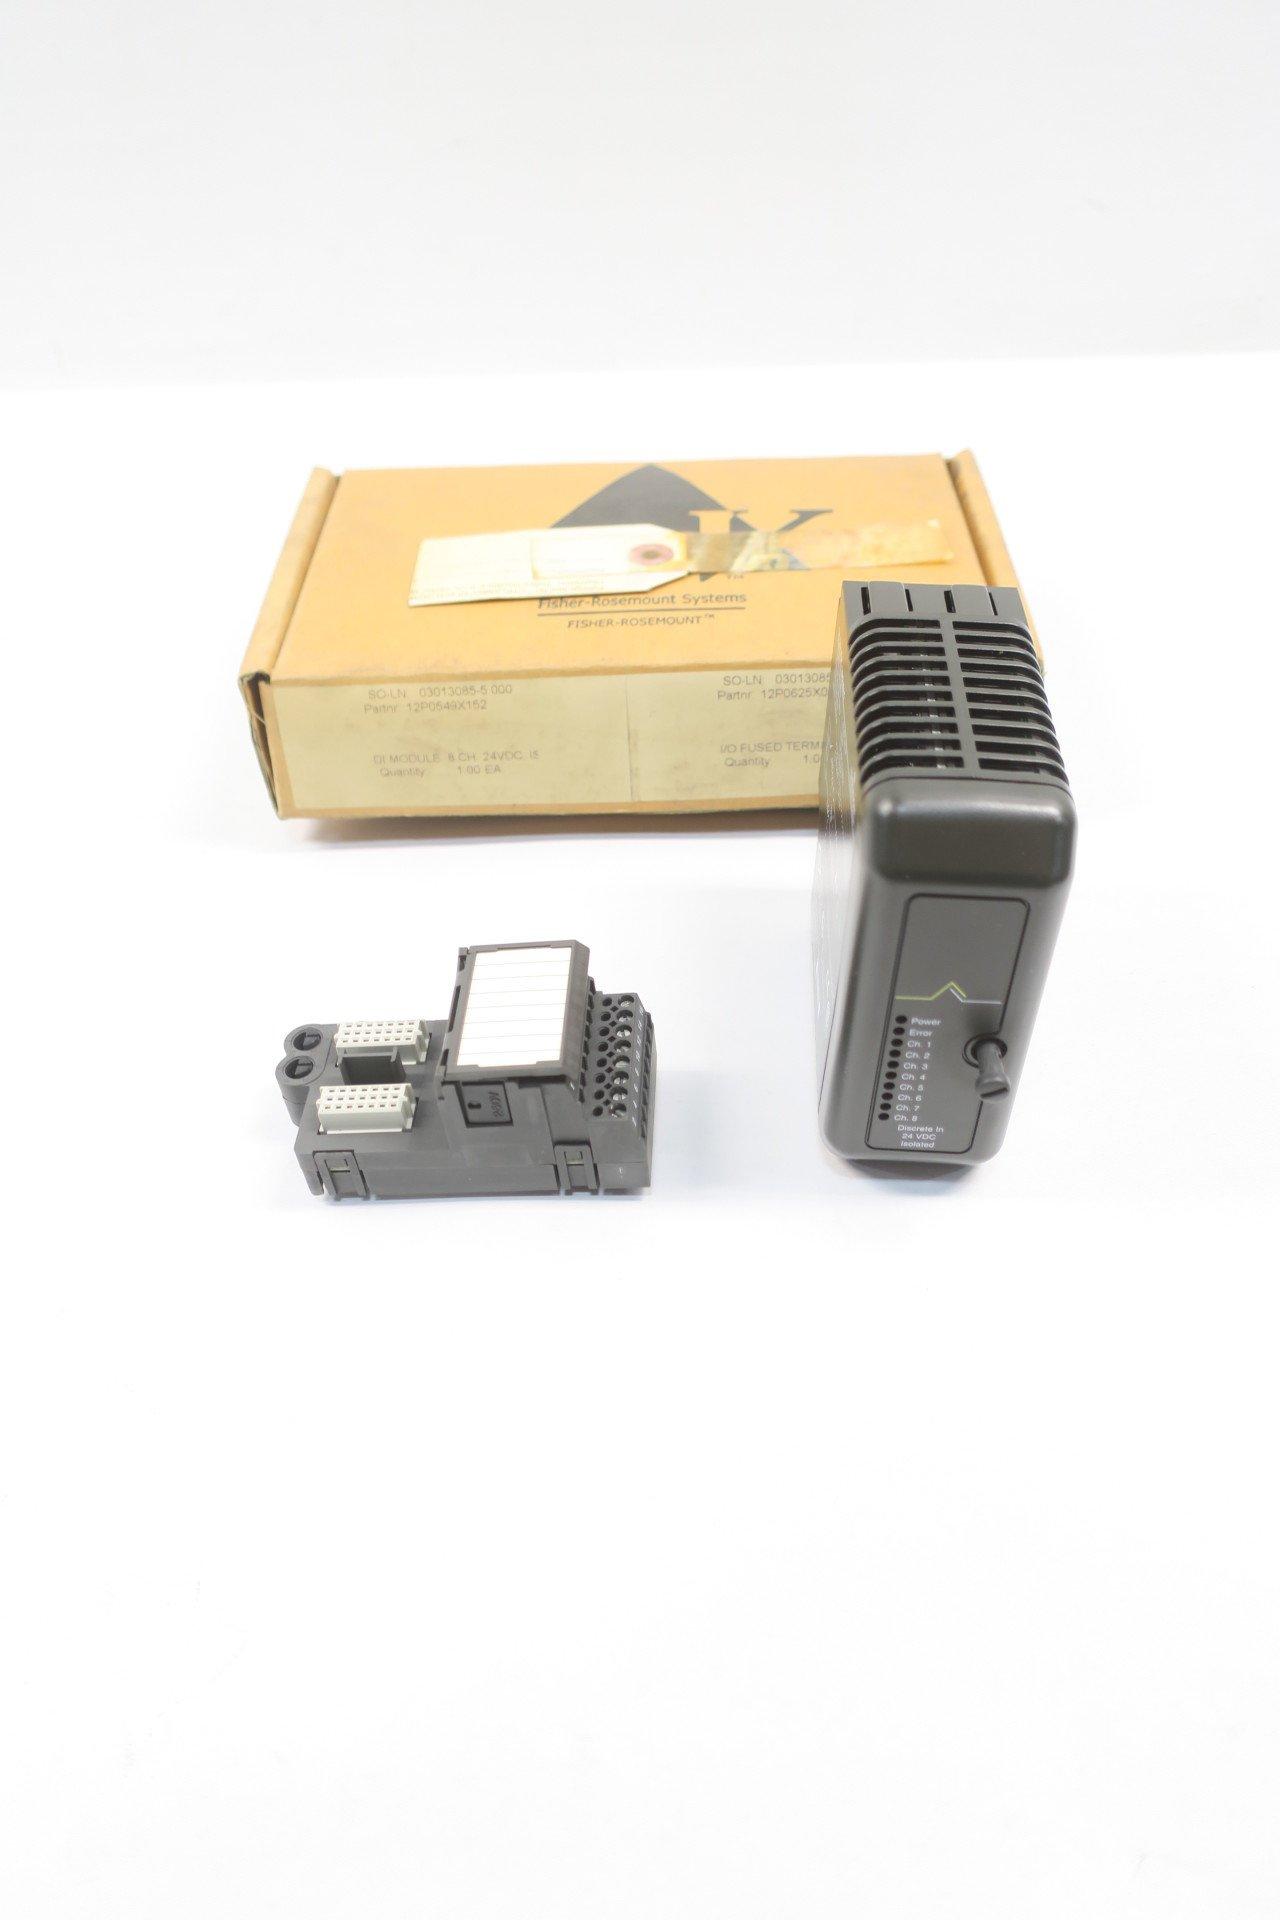 NEW EMERSON KJ3001X1-BA1 DI ISOLATED CARD REV G I/O MODULE D587414